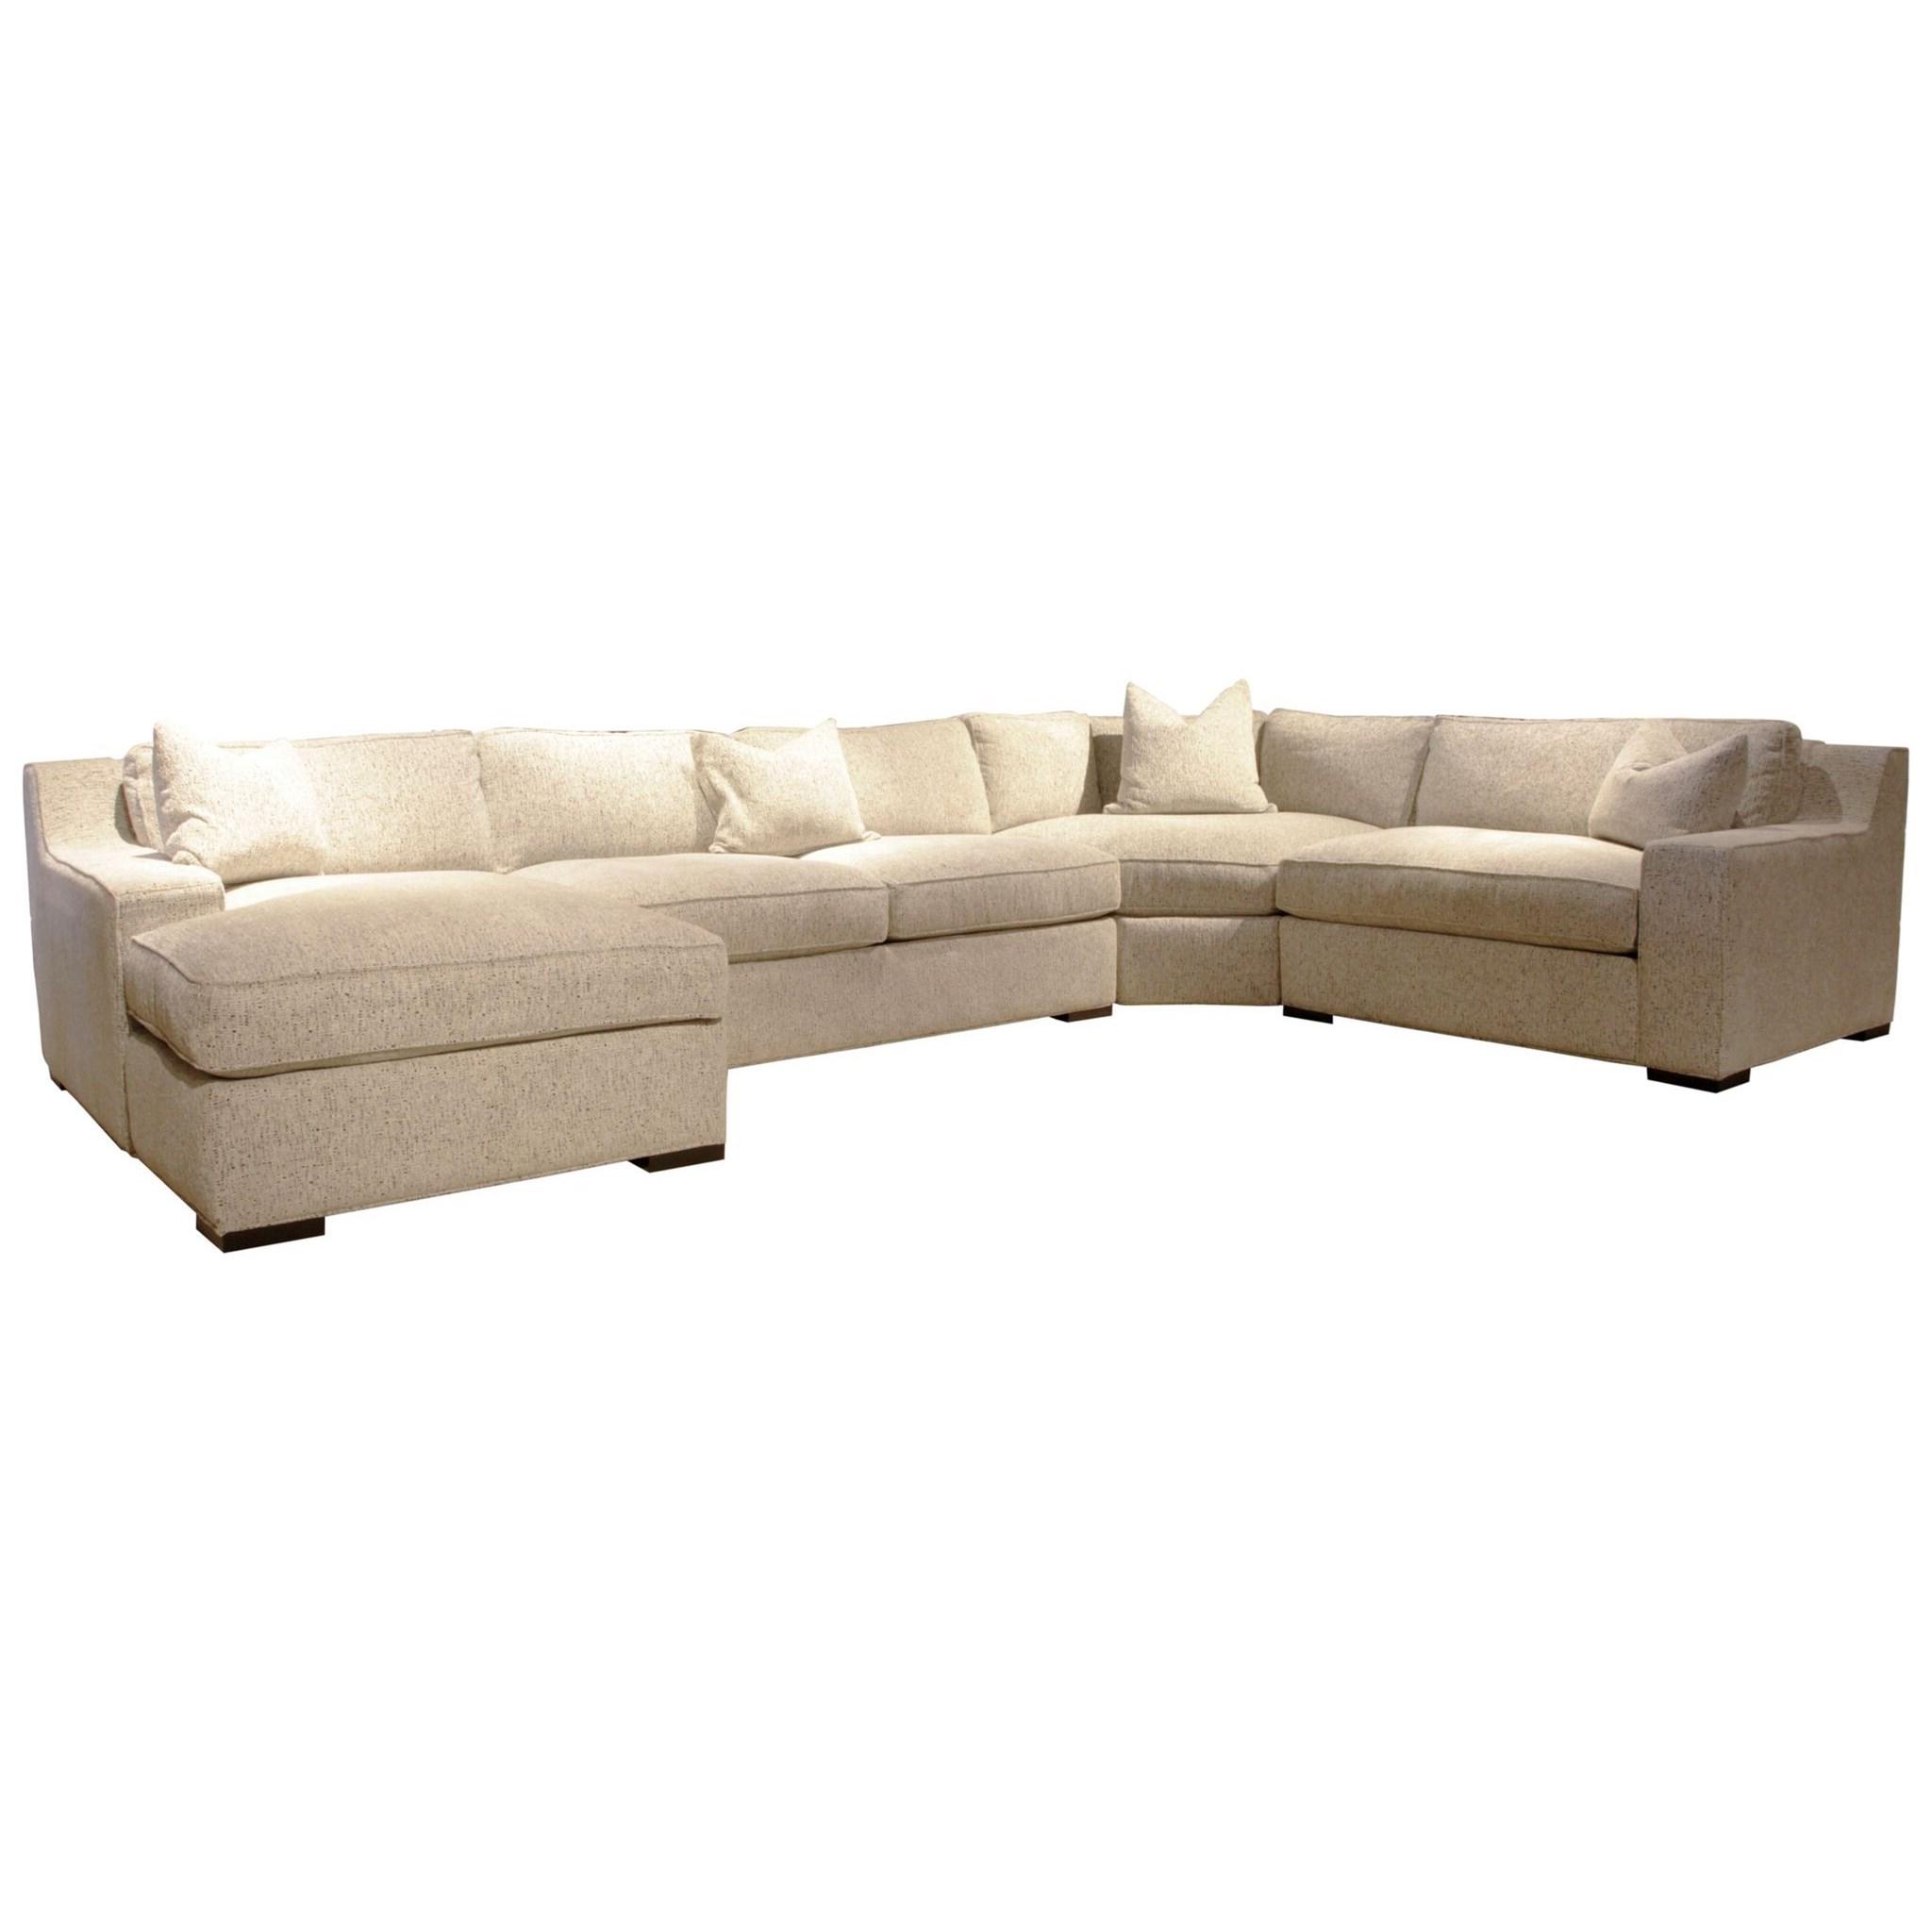 Morello Sectional Sofa at Williams & Kay